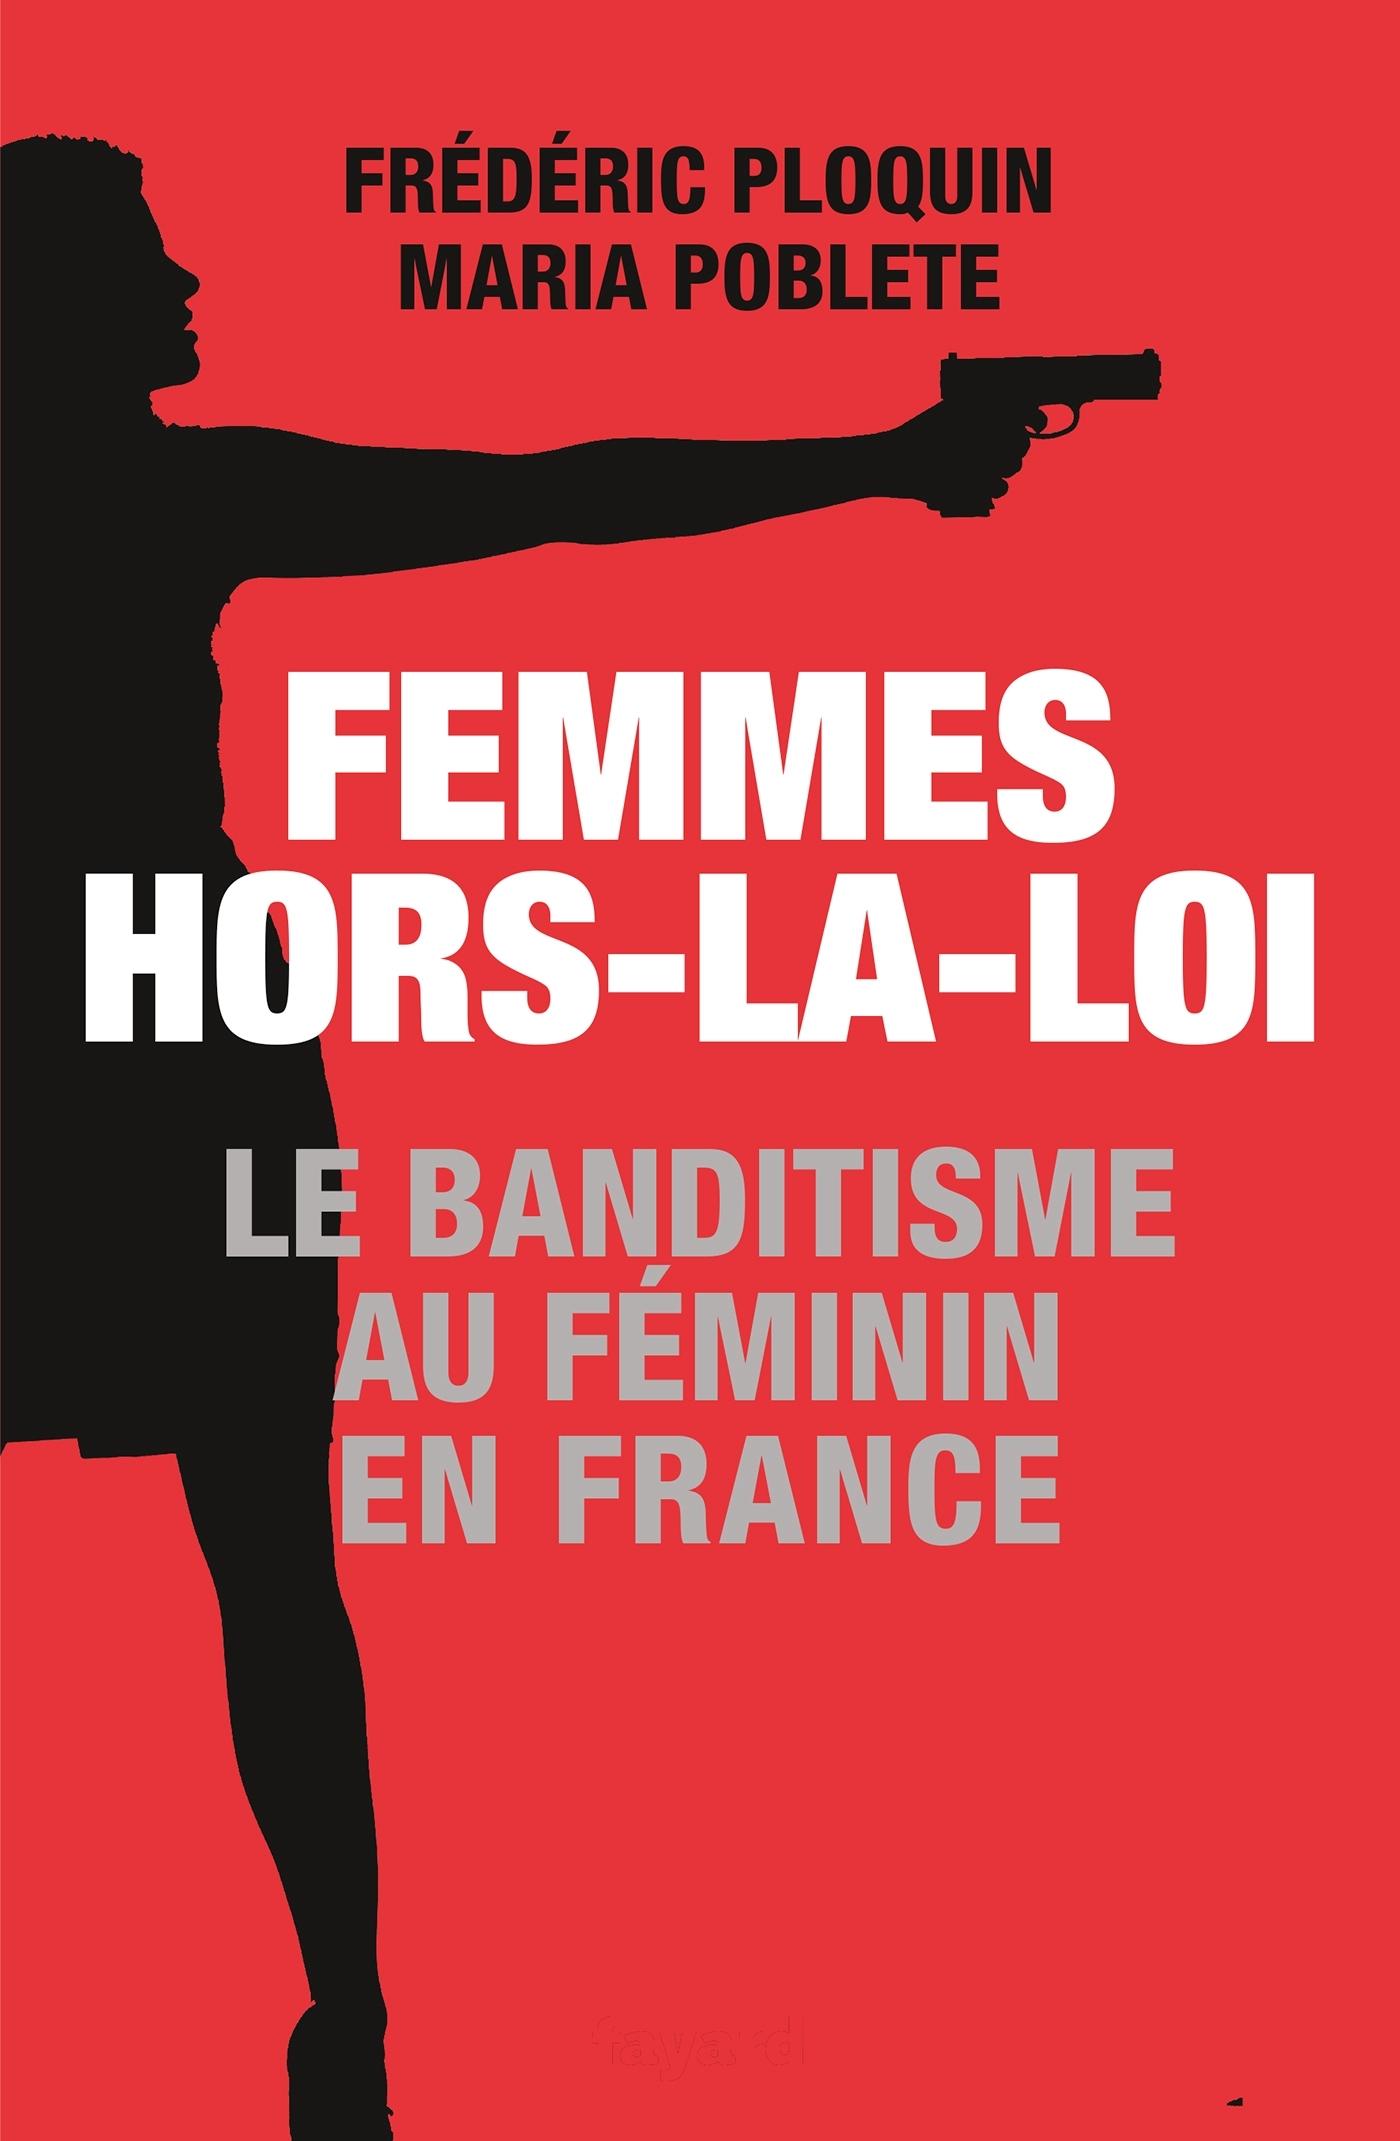 FEMMES HORS-LA-LOI